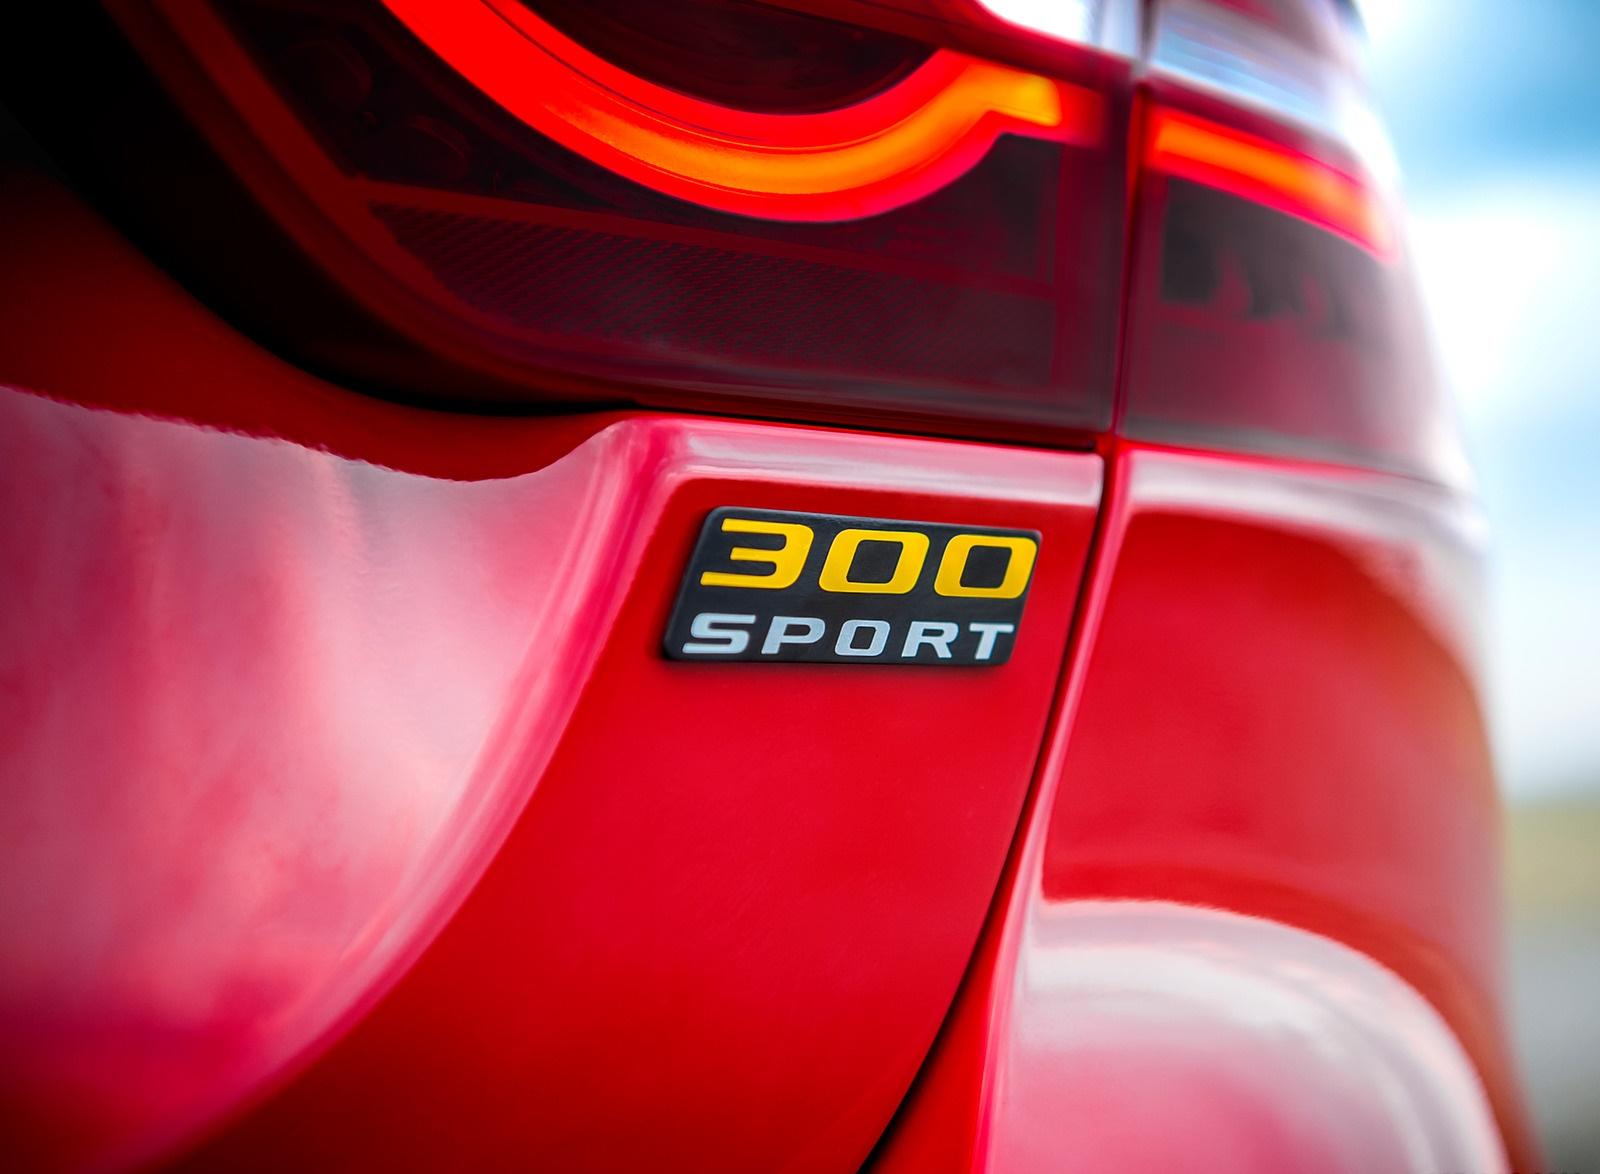 2019 Jaguar XE 300 SPORT Badge Wallpapers (11)